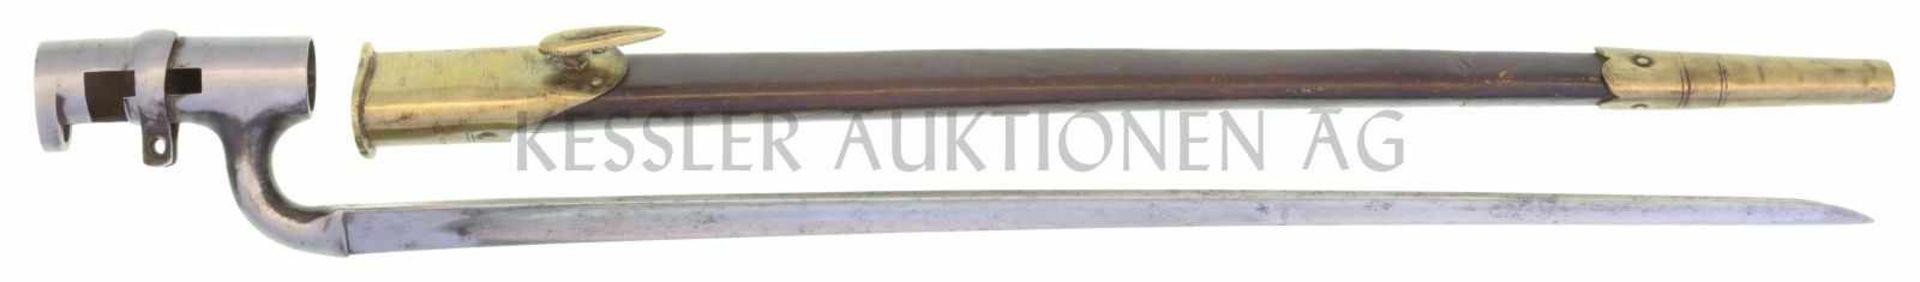 Stichbajonett zu IG 1842 KL 450mm, TL 520mm, dreikantige Klinke, blank poliert, fleckig. Schraube am